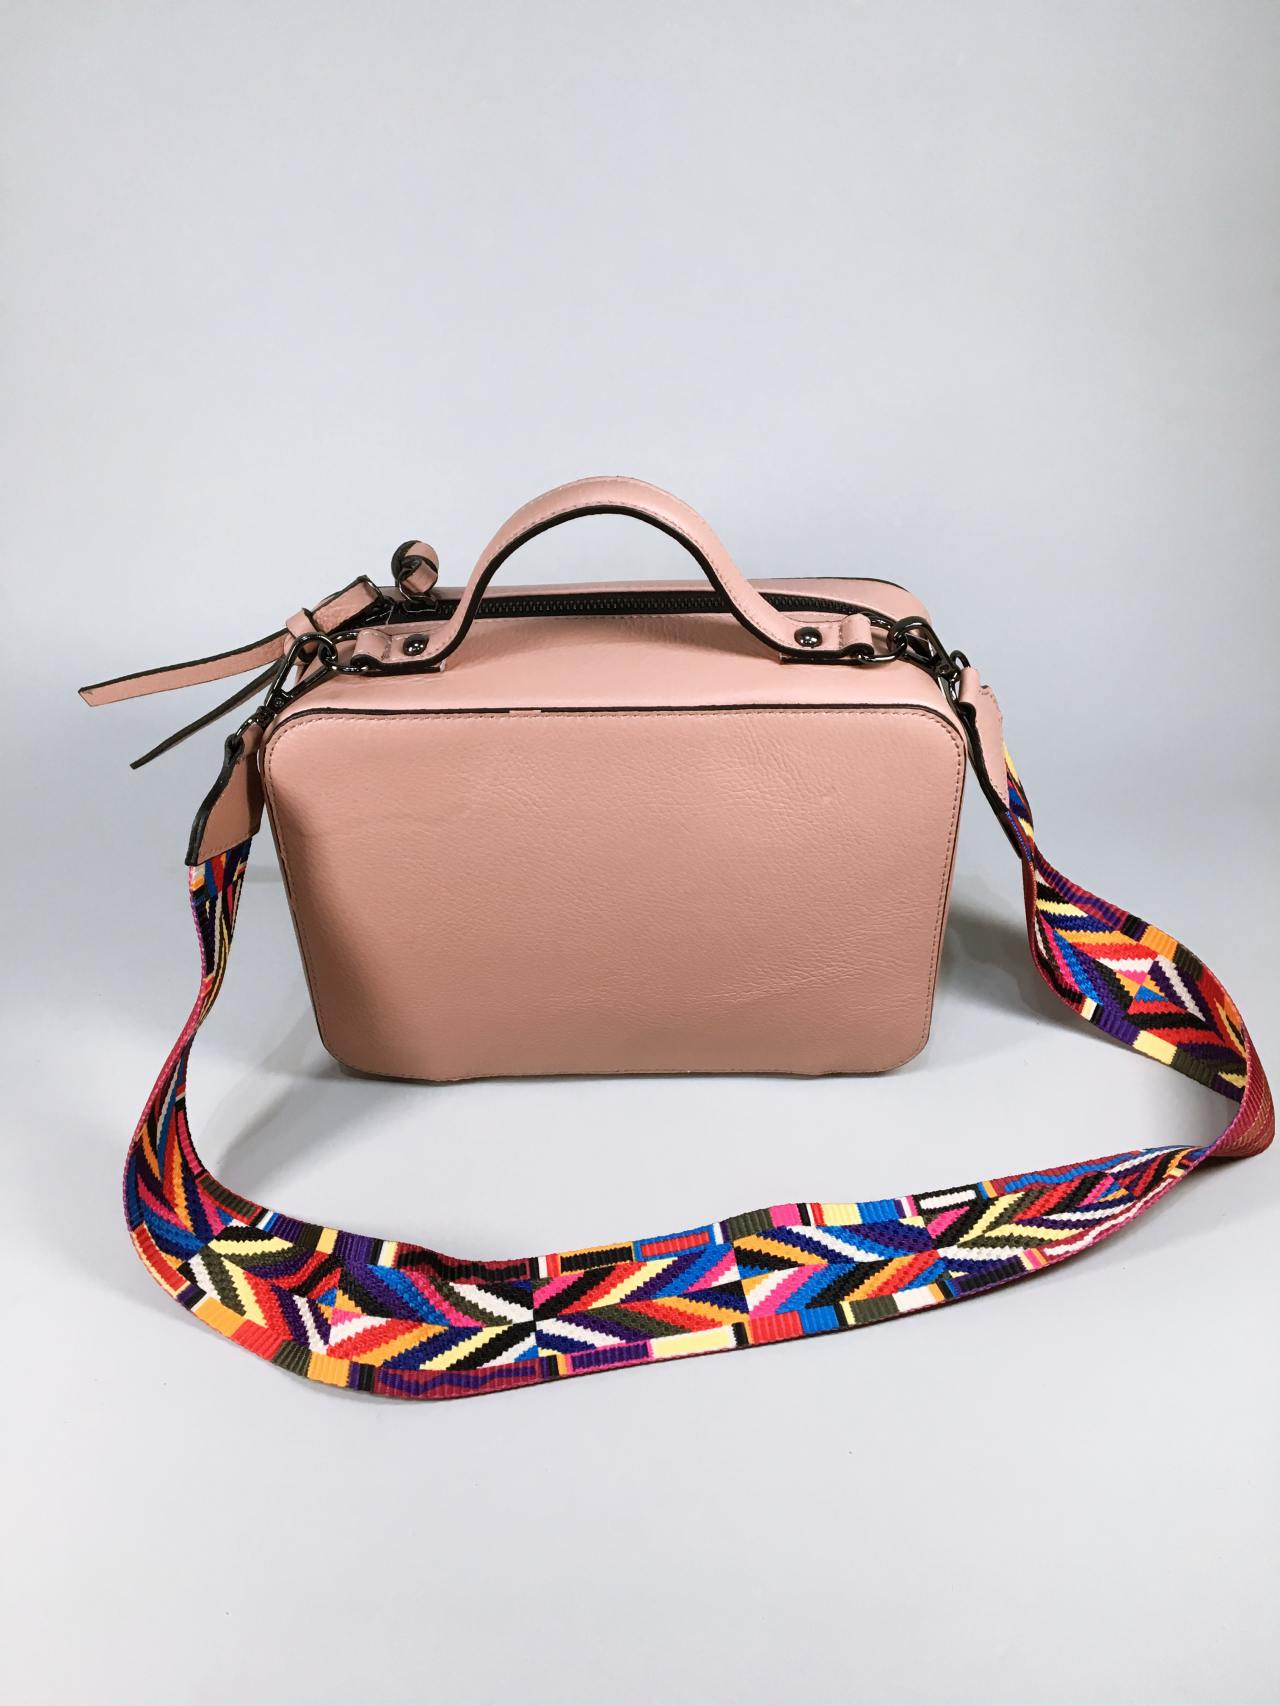 Kožená kabelka Corry pudrová – Simm-Fashion.cz b433553ec4